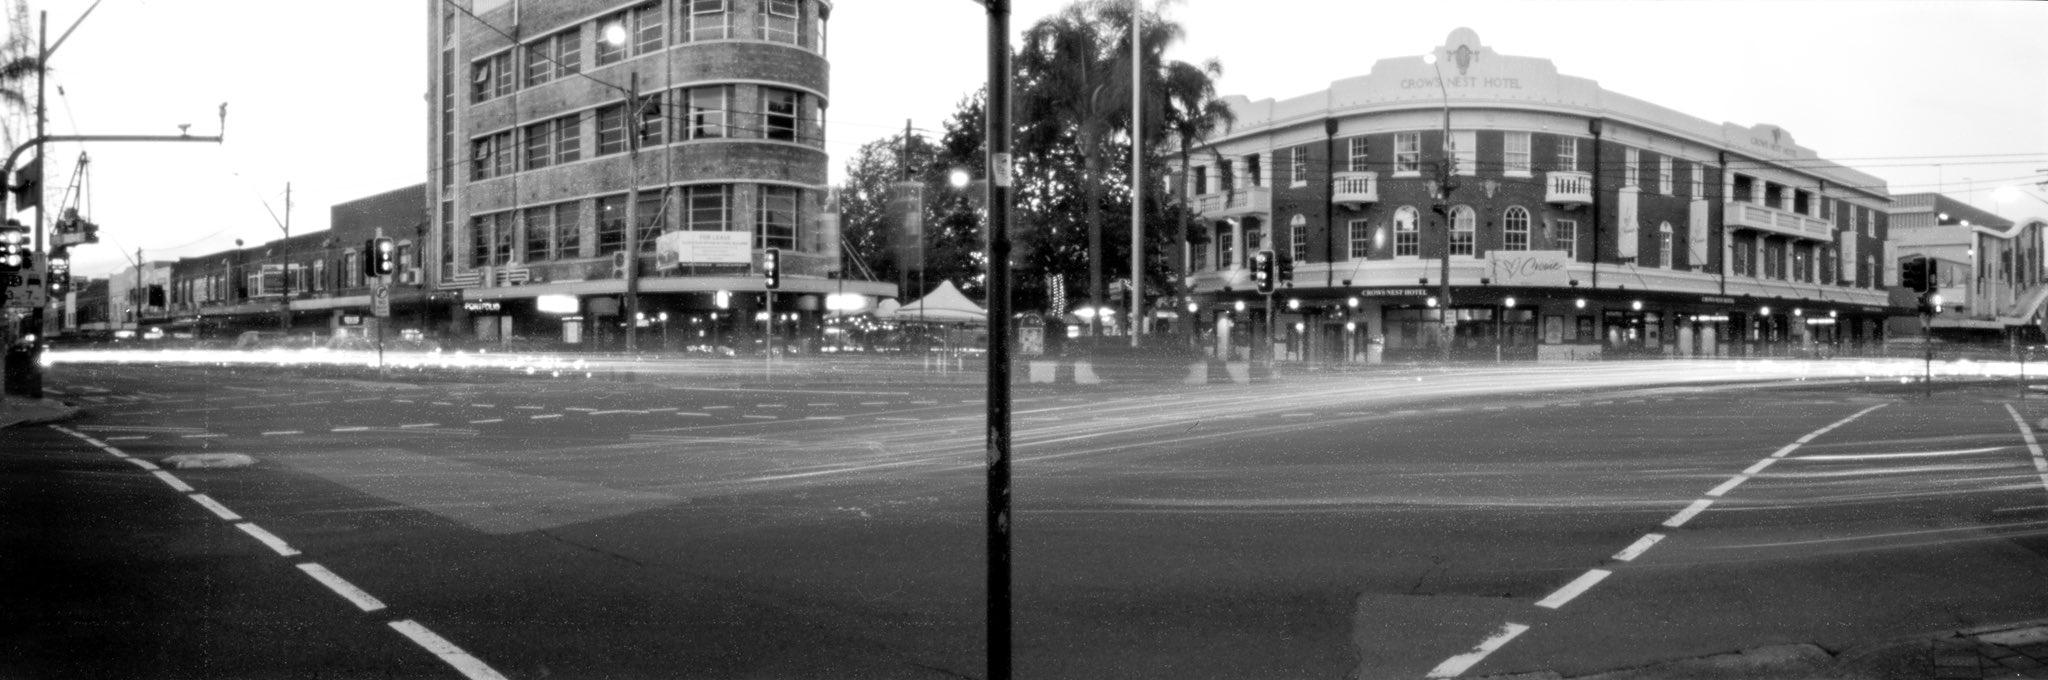 Replying to @ILFORDPhoto Crows Nest Crossroads at Dusk 19min Terrapin Kaiju Pinhole exposure April 2021 #fp4 #ilfordphoto #fridayfavourites #ffpinhole @ILFORDPhoto #ilovesydney #shootfilmbenice #believeinfilm #filmphotography